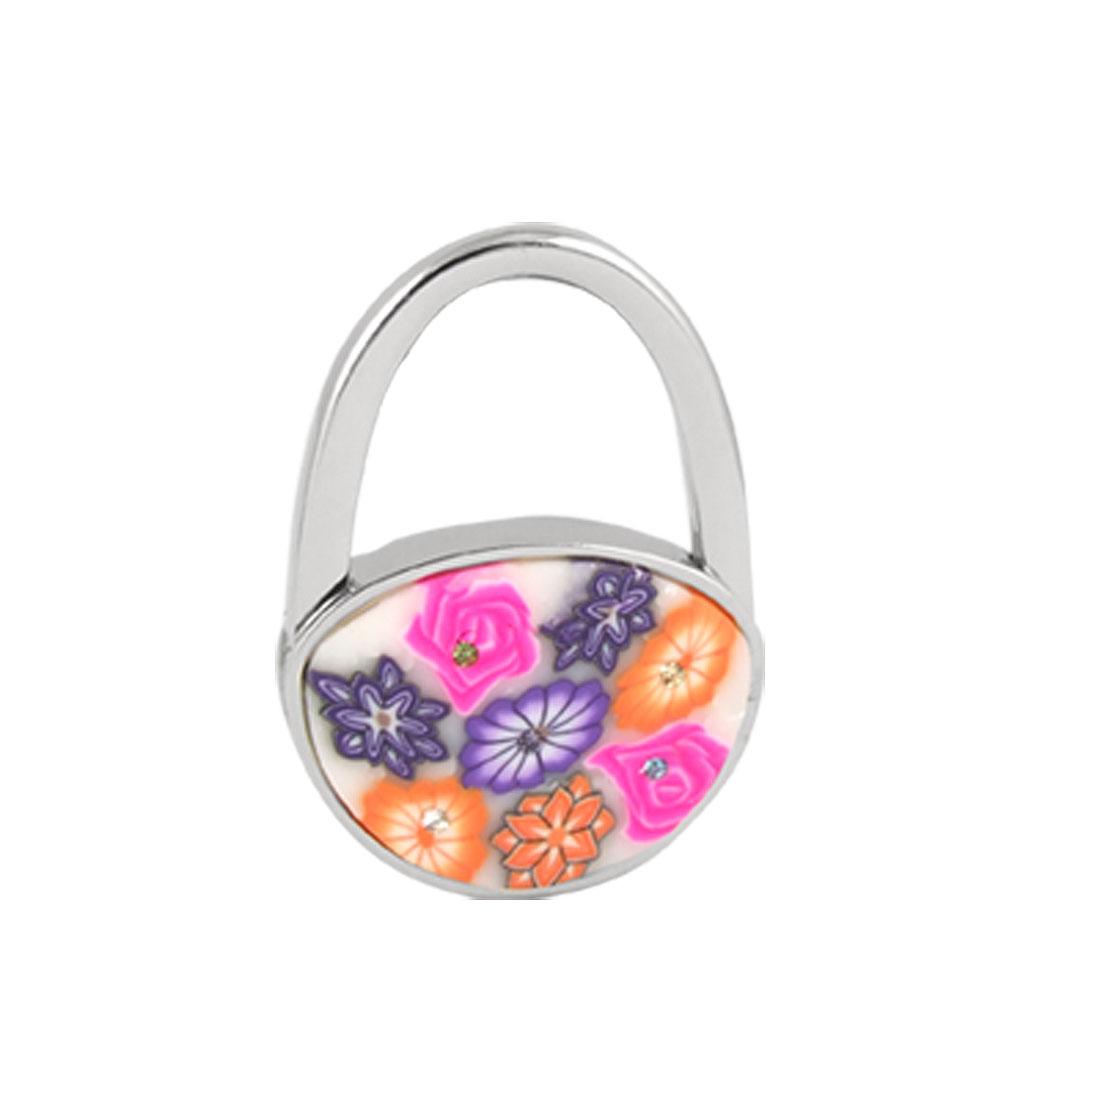 Multicolor Rhinestone Flower Accent Padlock Shaped Handbag Folding Hook